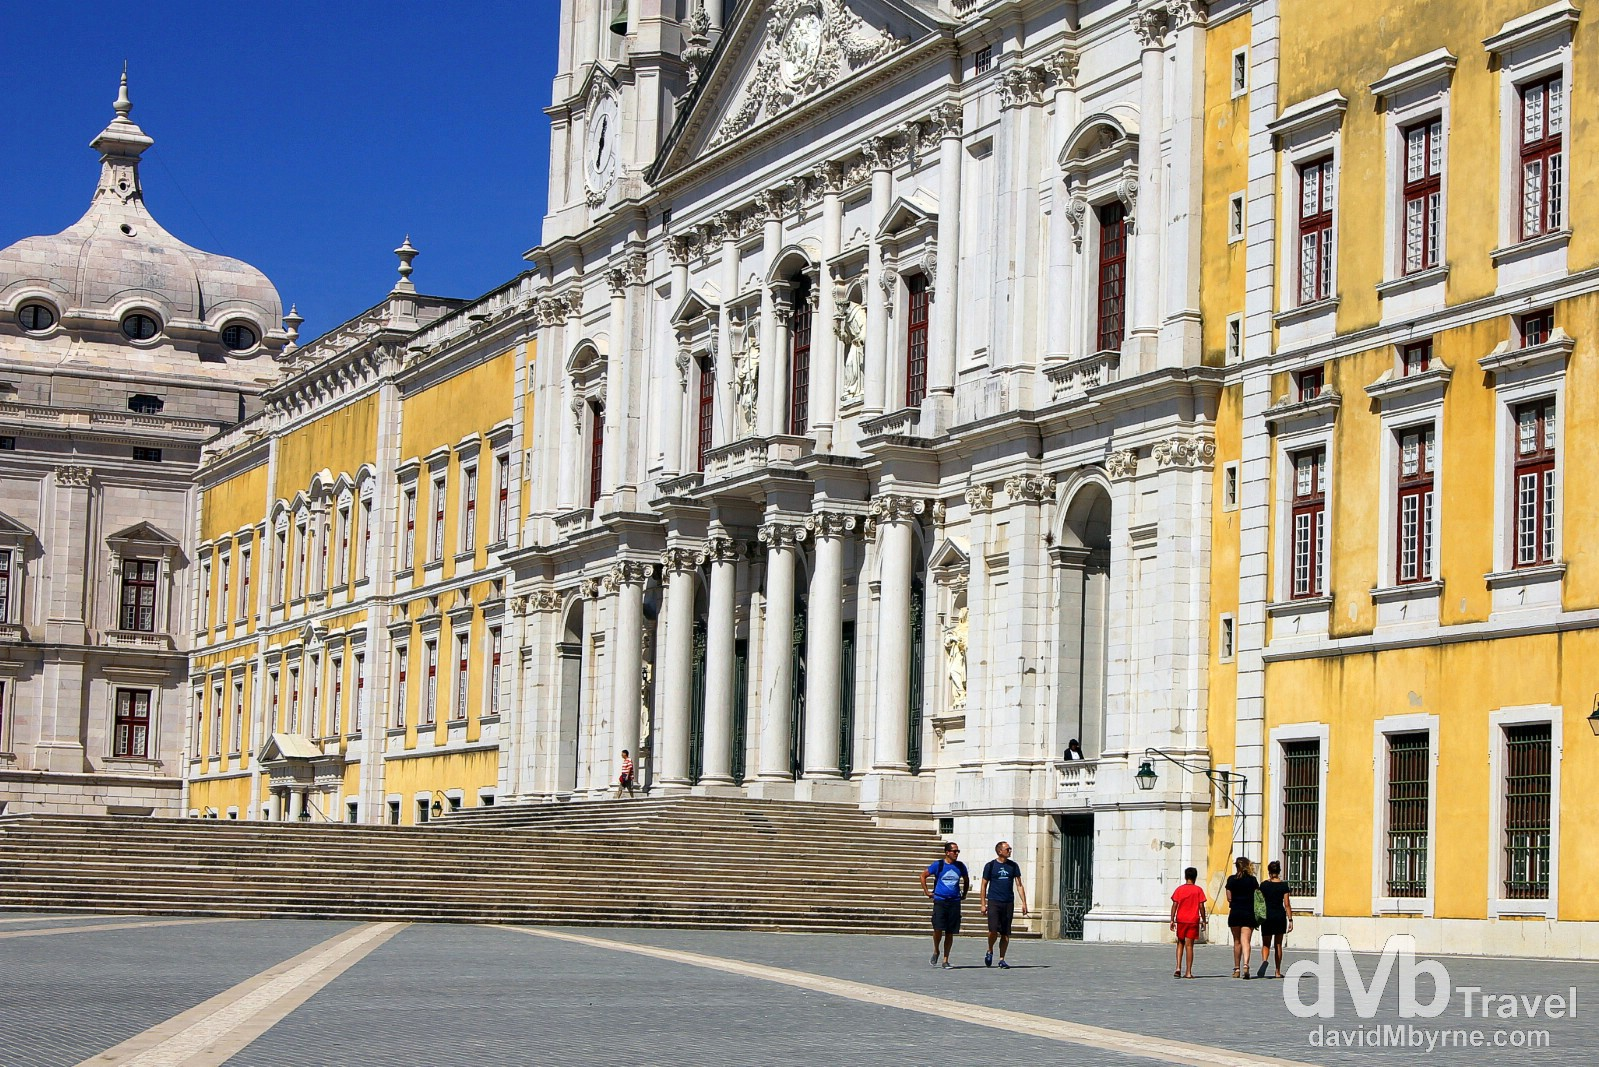 The Palacio Nacional de Mafra (Mafra National Palace), Mafra, Portugal. August 23rd 2013.